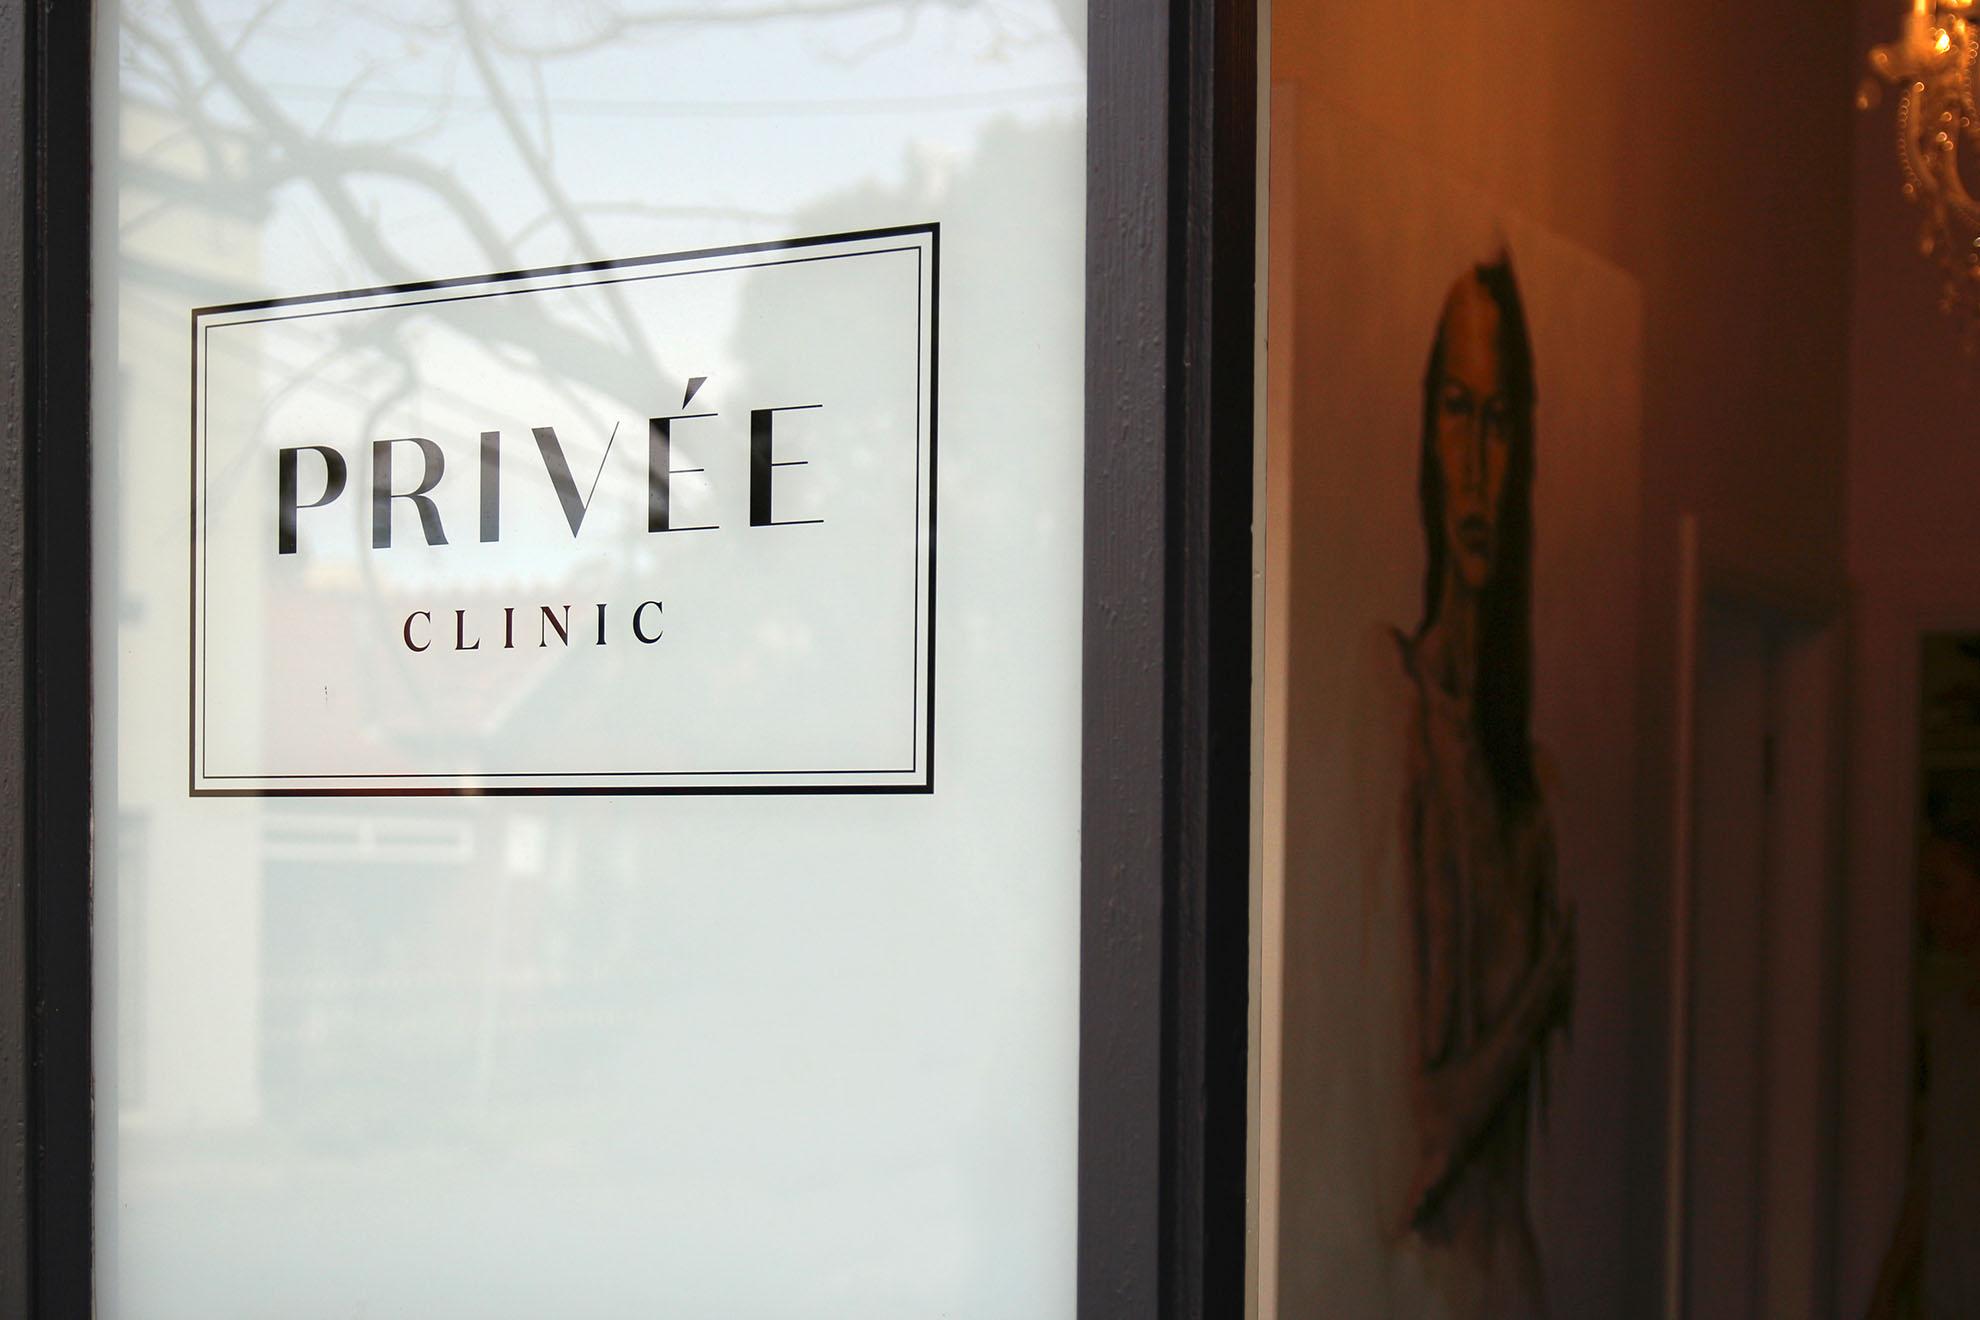 PriveeClinic006